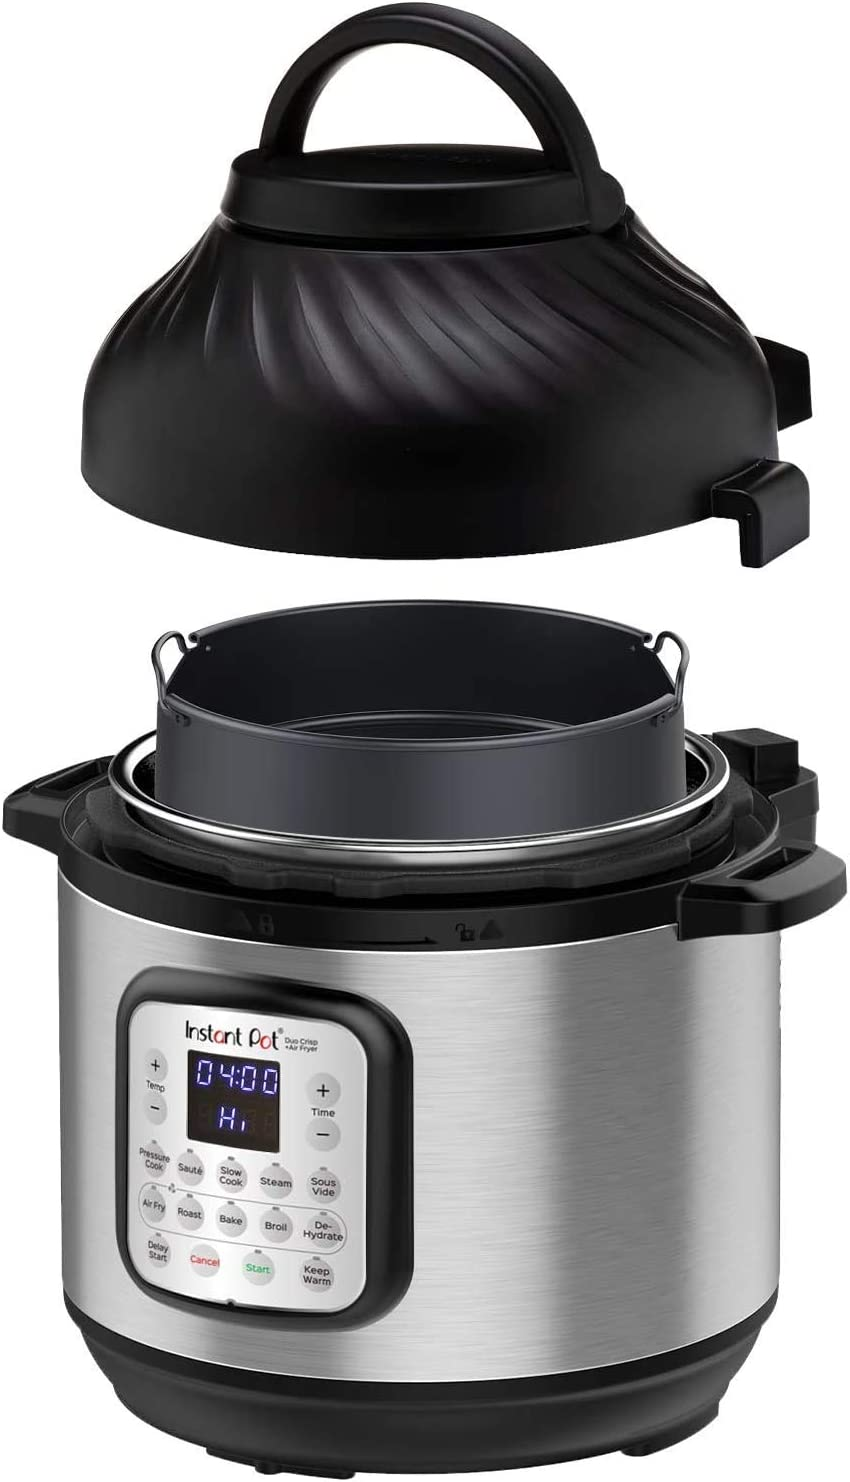 Instant Pot Duo Crisp 11-in-1 Multi-Use Pressure Cooker and Air Fryer, 6 Quart